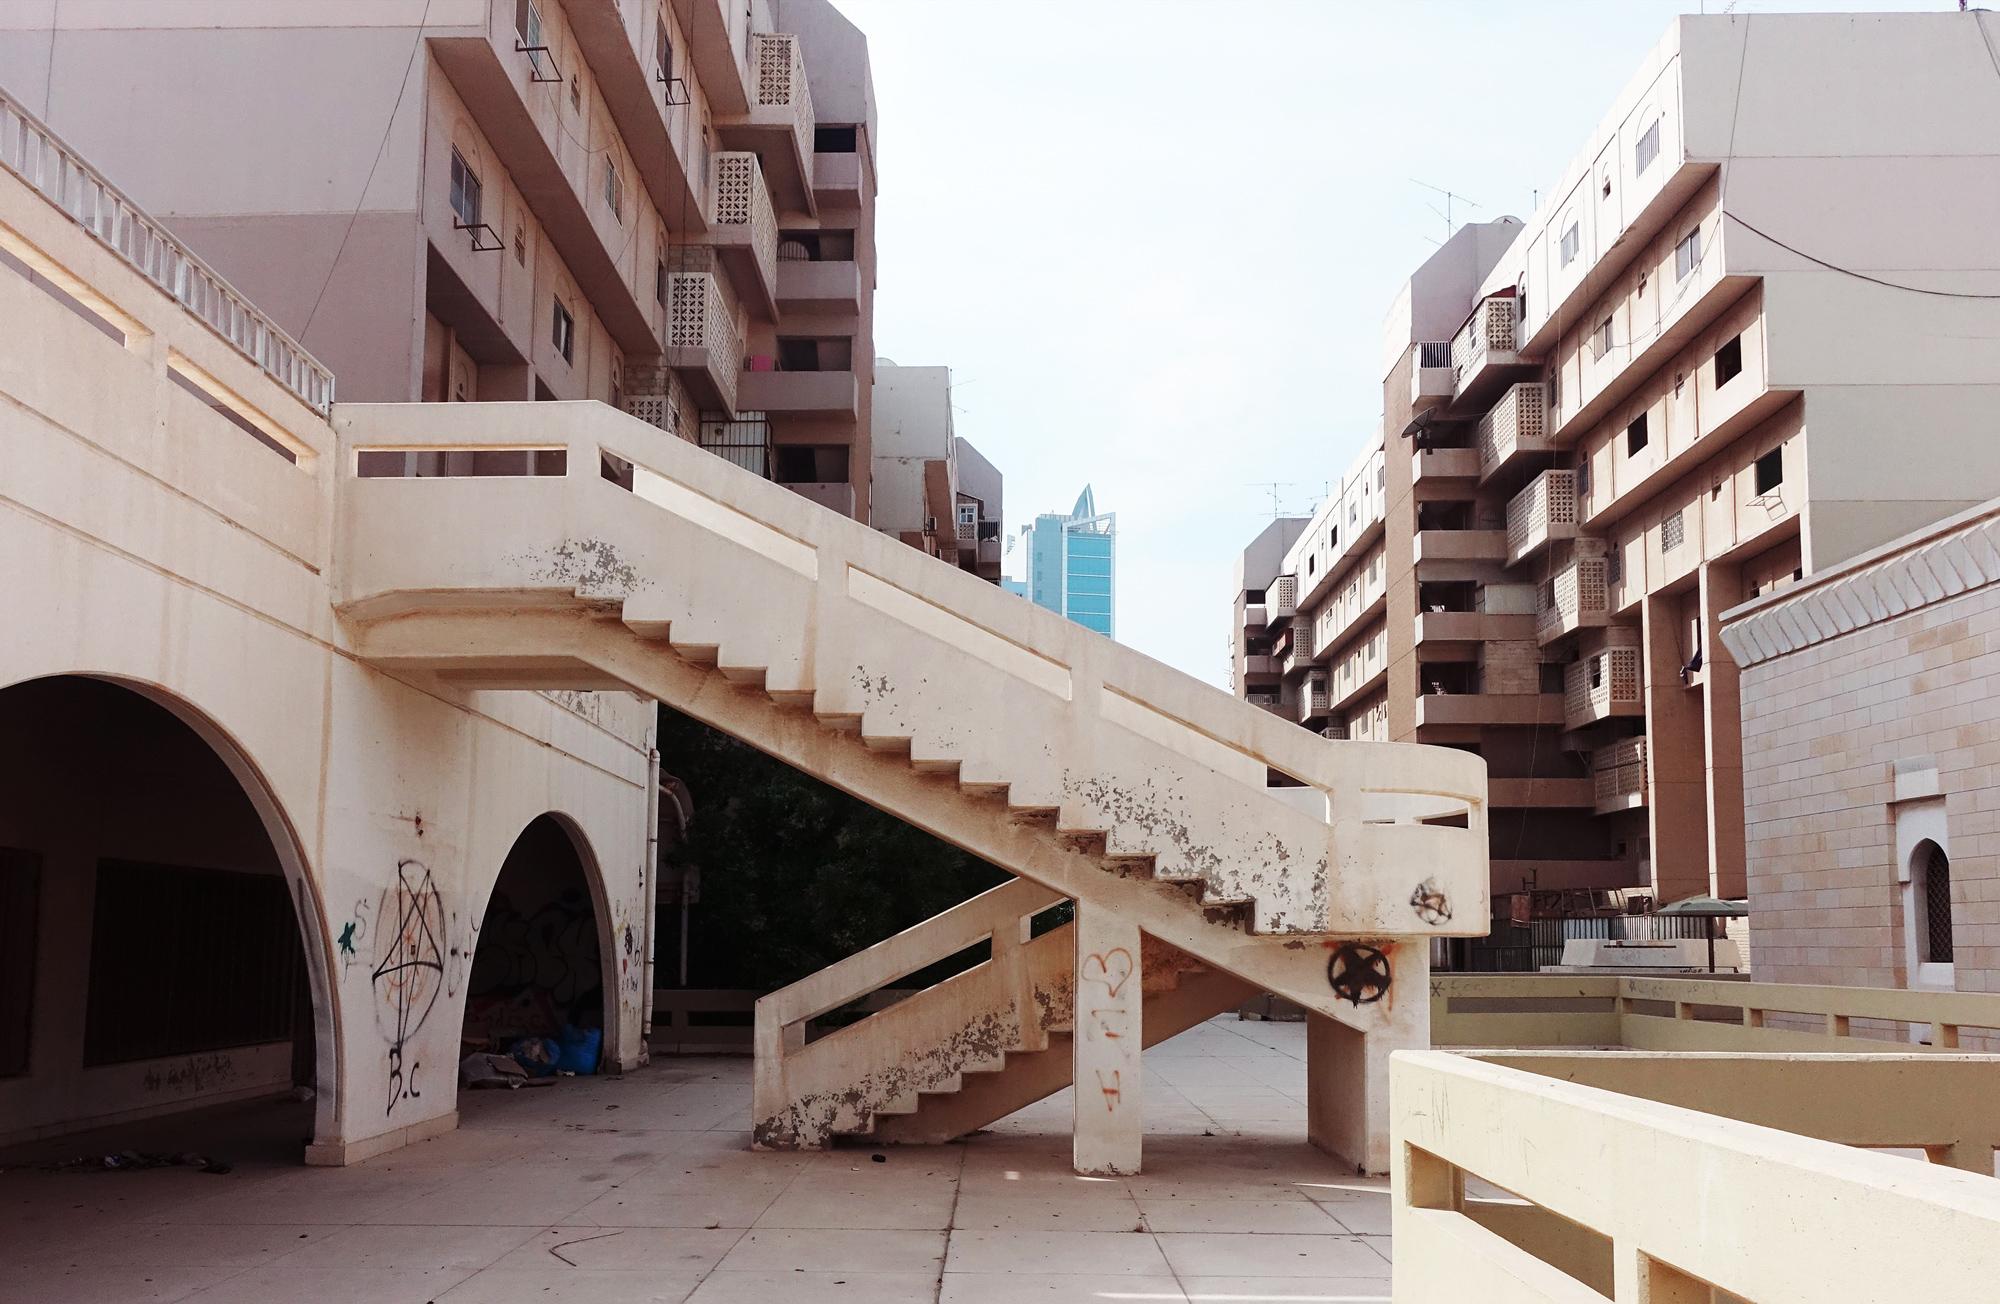 urbanbacklog-kuwait-dhari-al-muawed-4.jpg